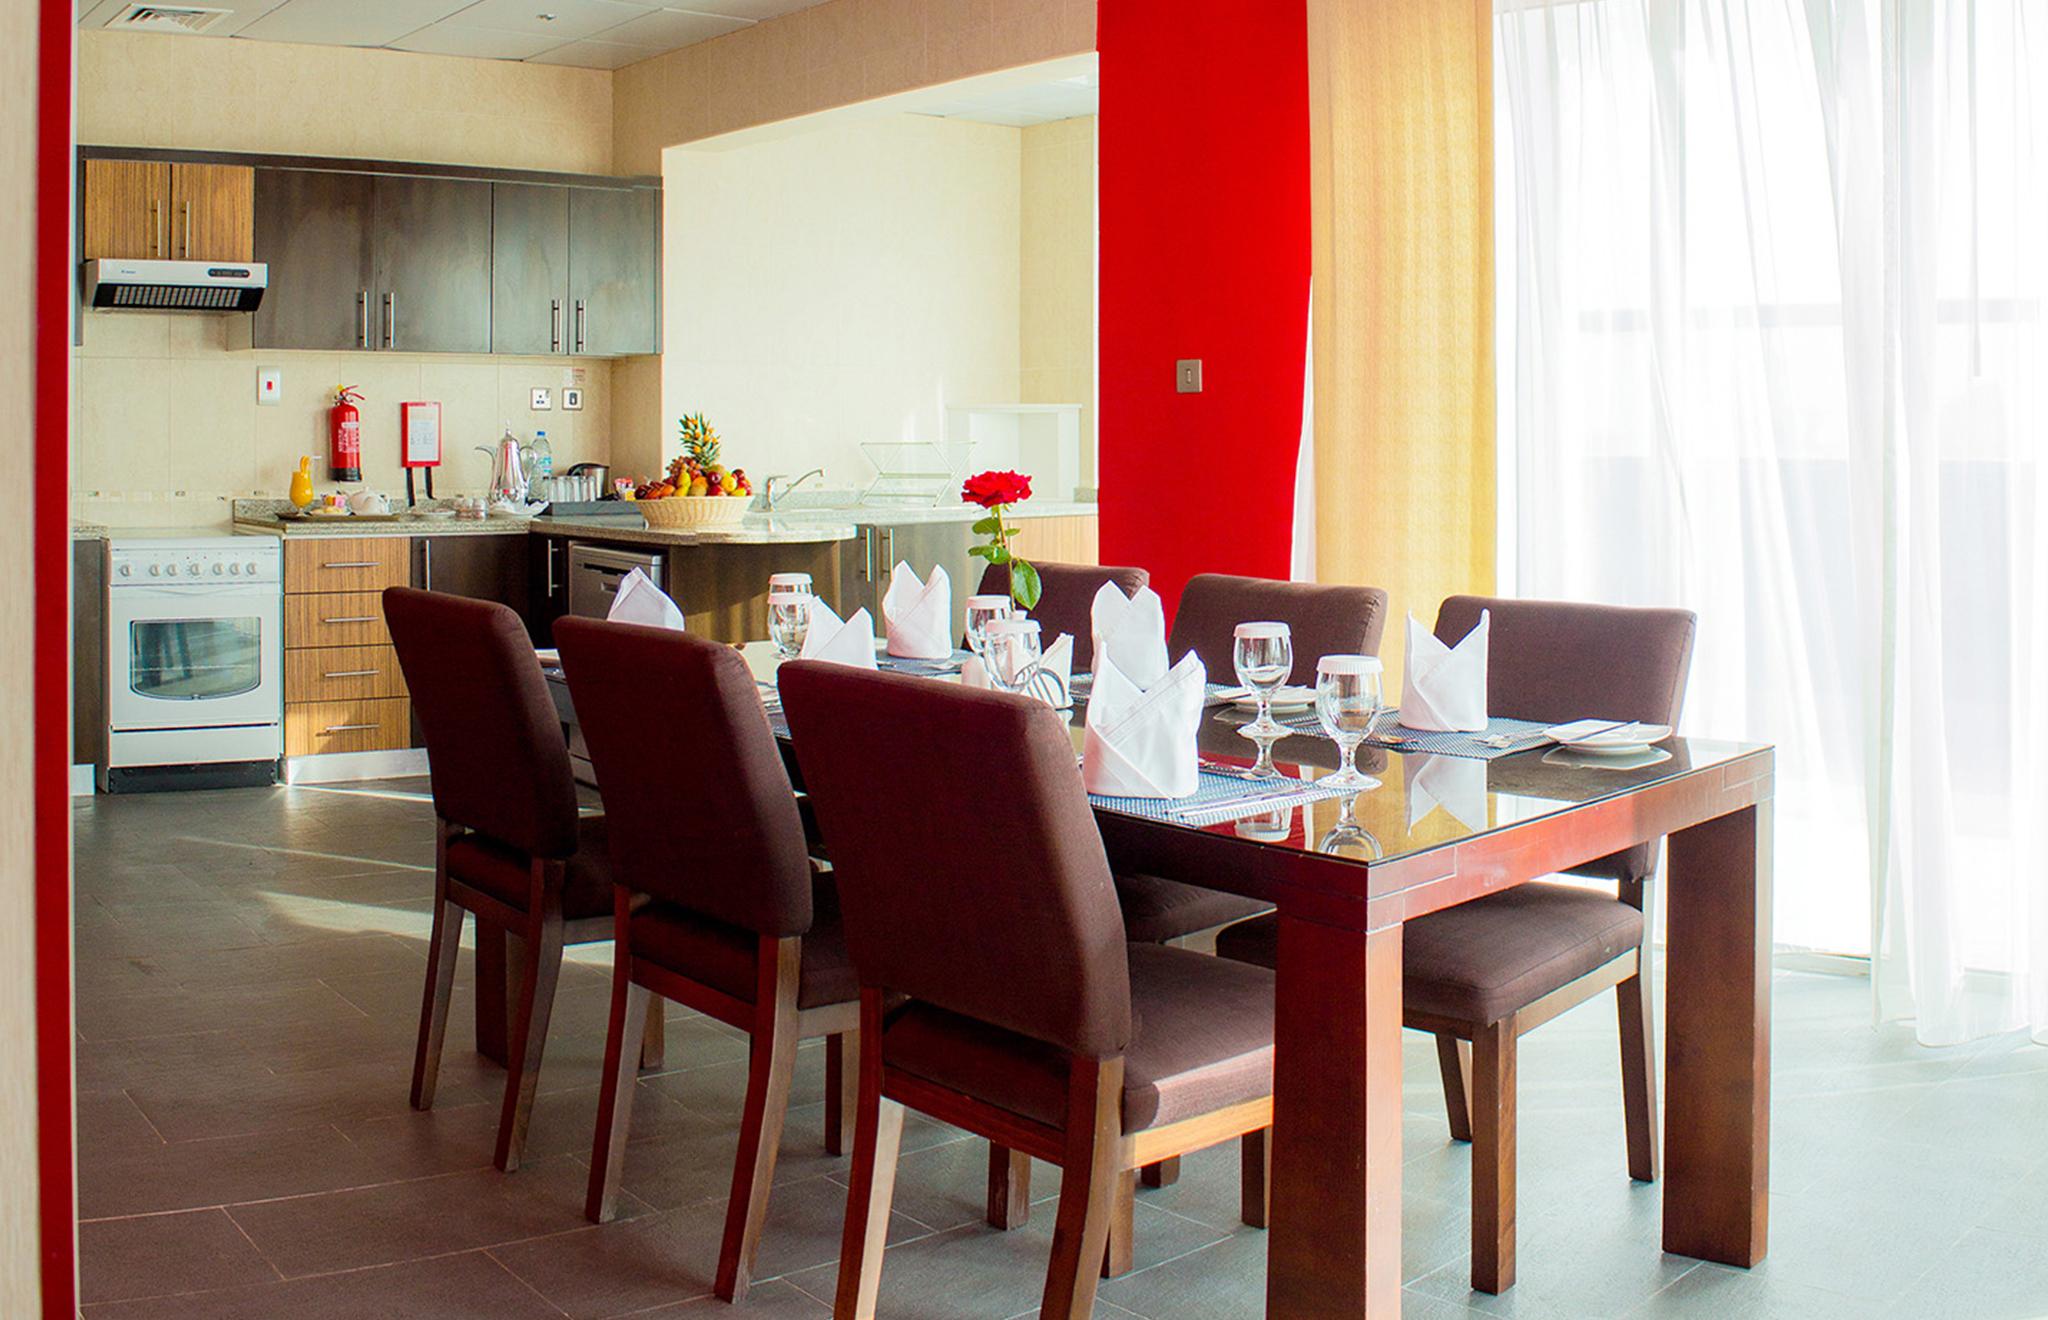 Image CPHA_4BR_Penthouse_Dining_Area.jpg